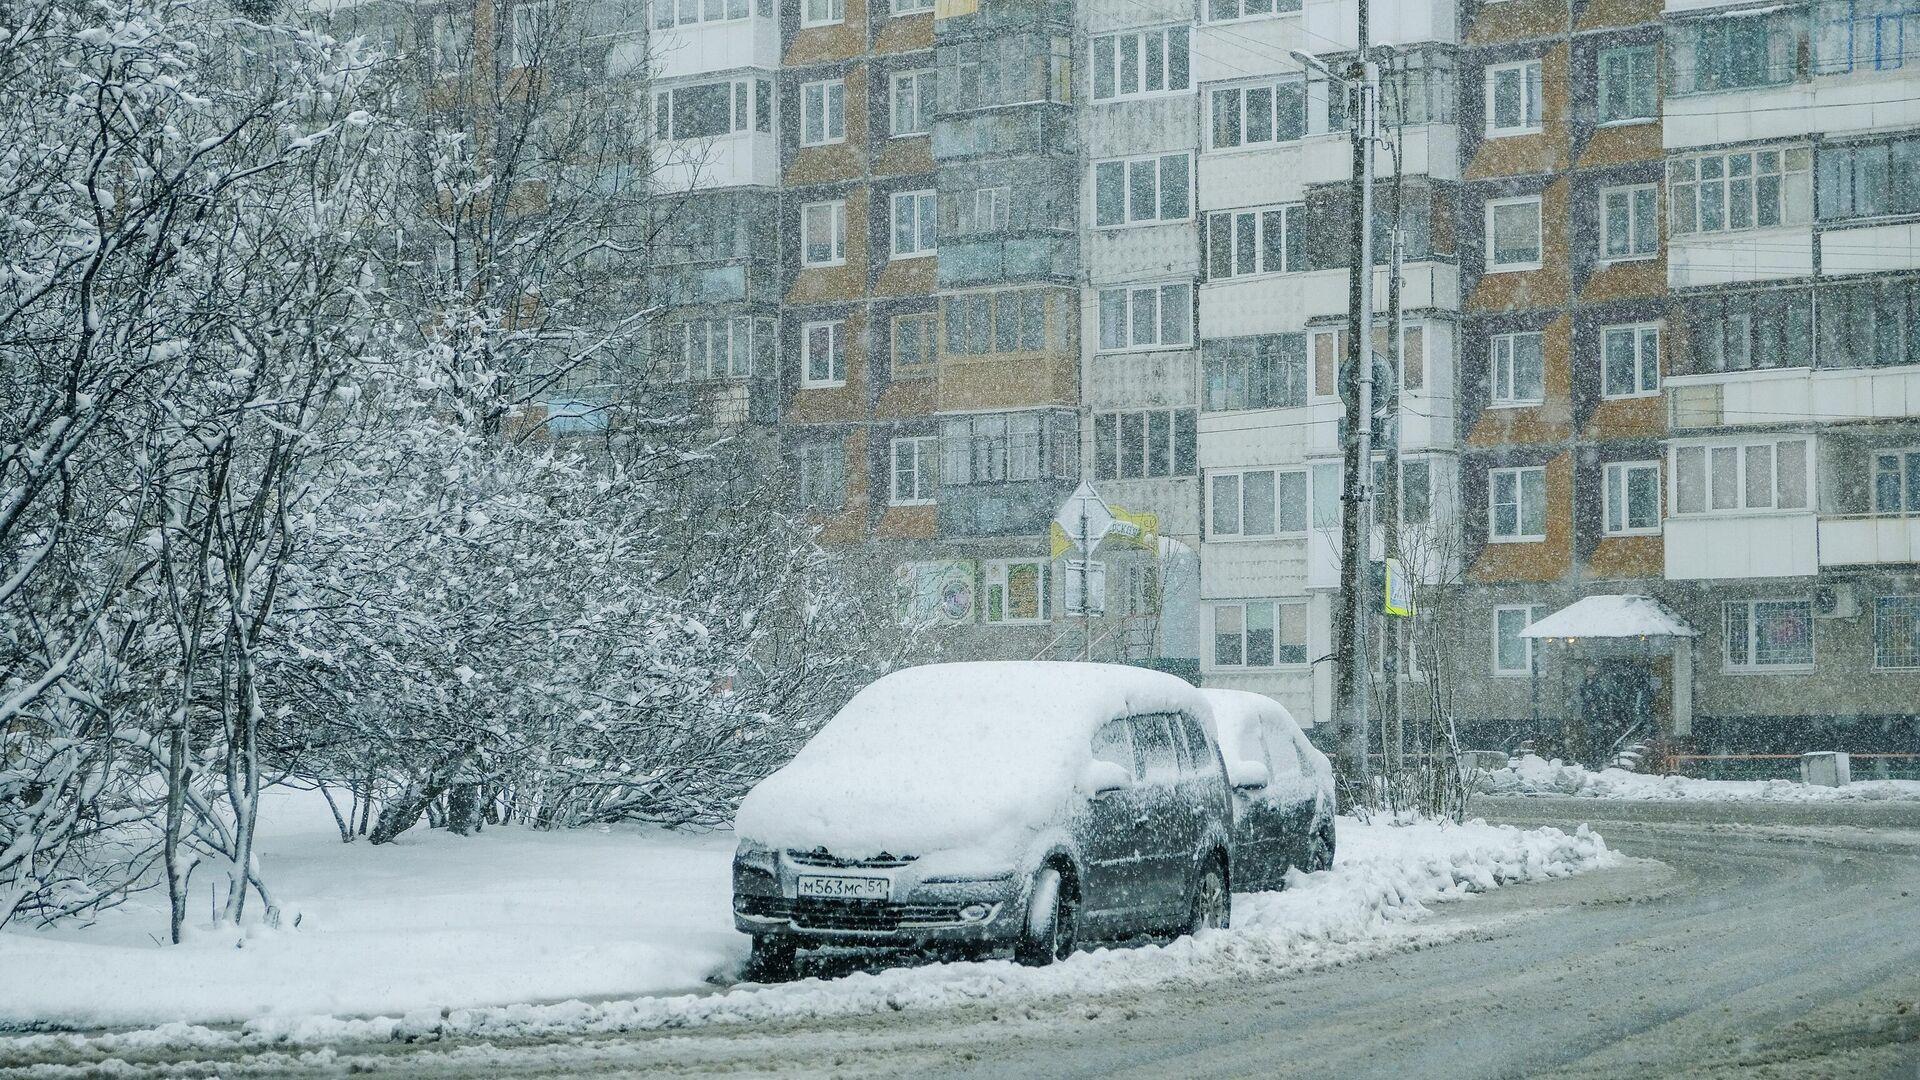 Снегопад в Мурманске - РИА Новости, 1920, 21.10.2020